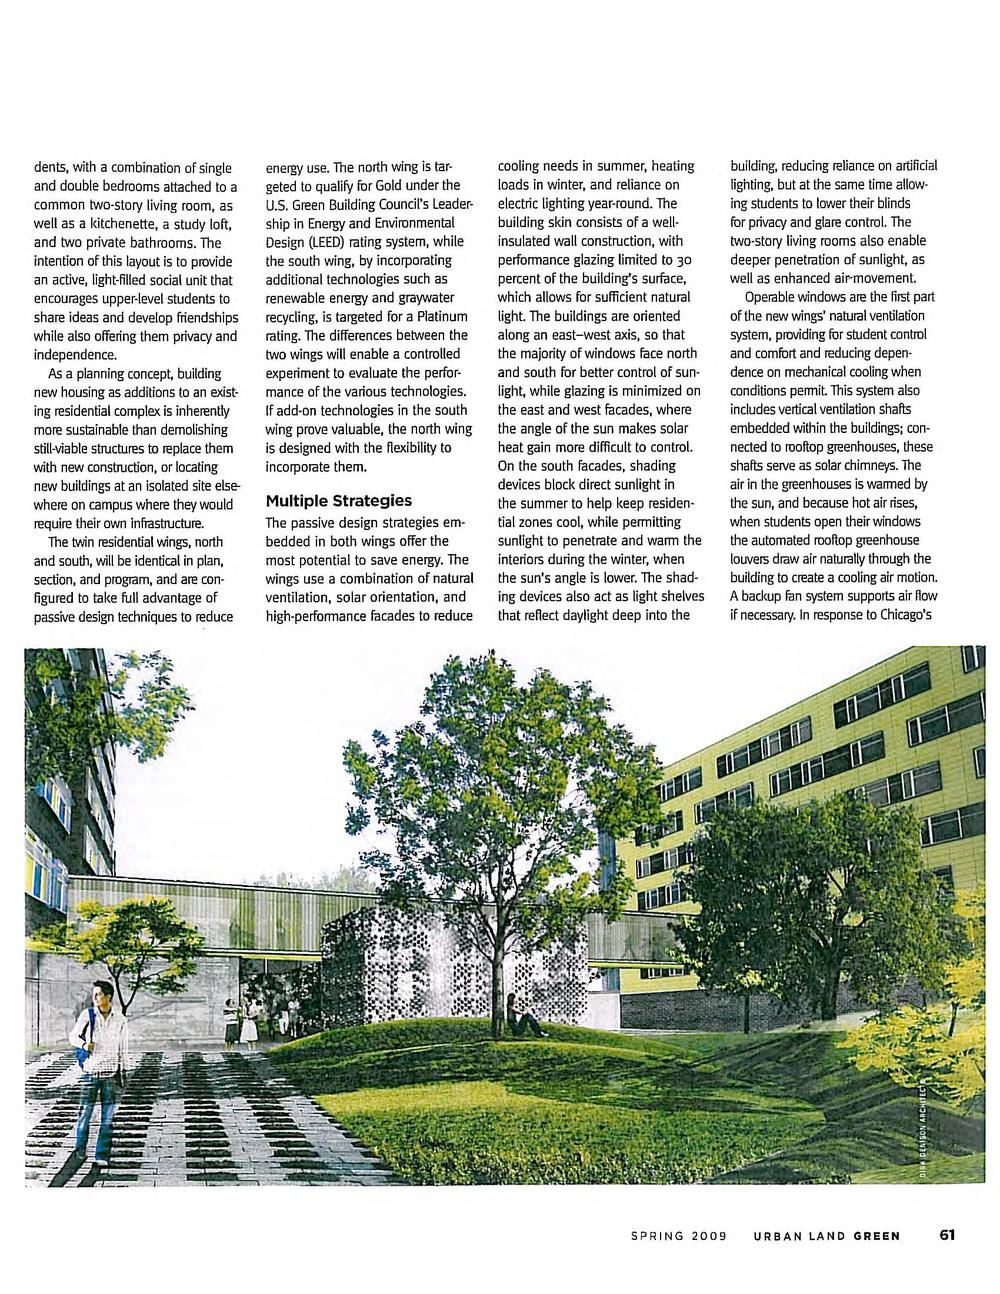 2009 - Urban Land Green - IIT 3.jpg